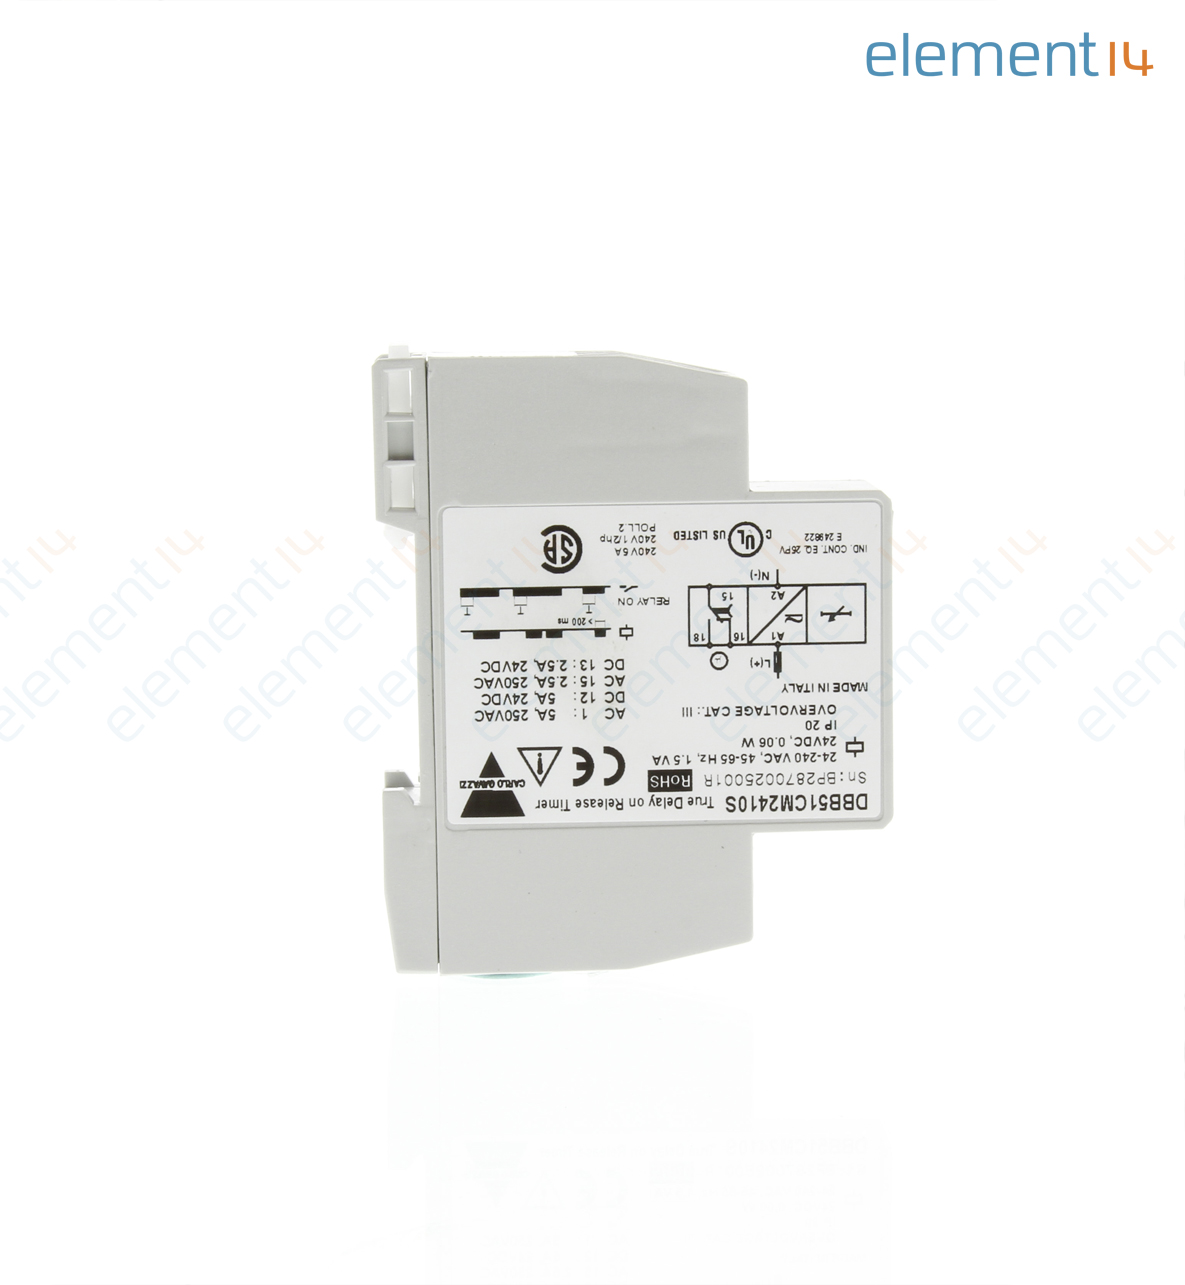 Dbb51cm2410s Carlo Gavazzi Analog Timer Dbb51 Series Delay On Power Changeover Relay Release 6 S 60 1 Ranges